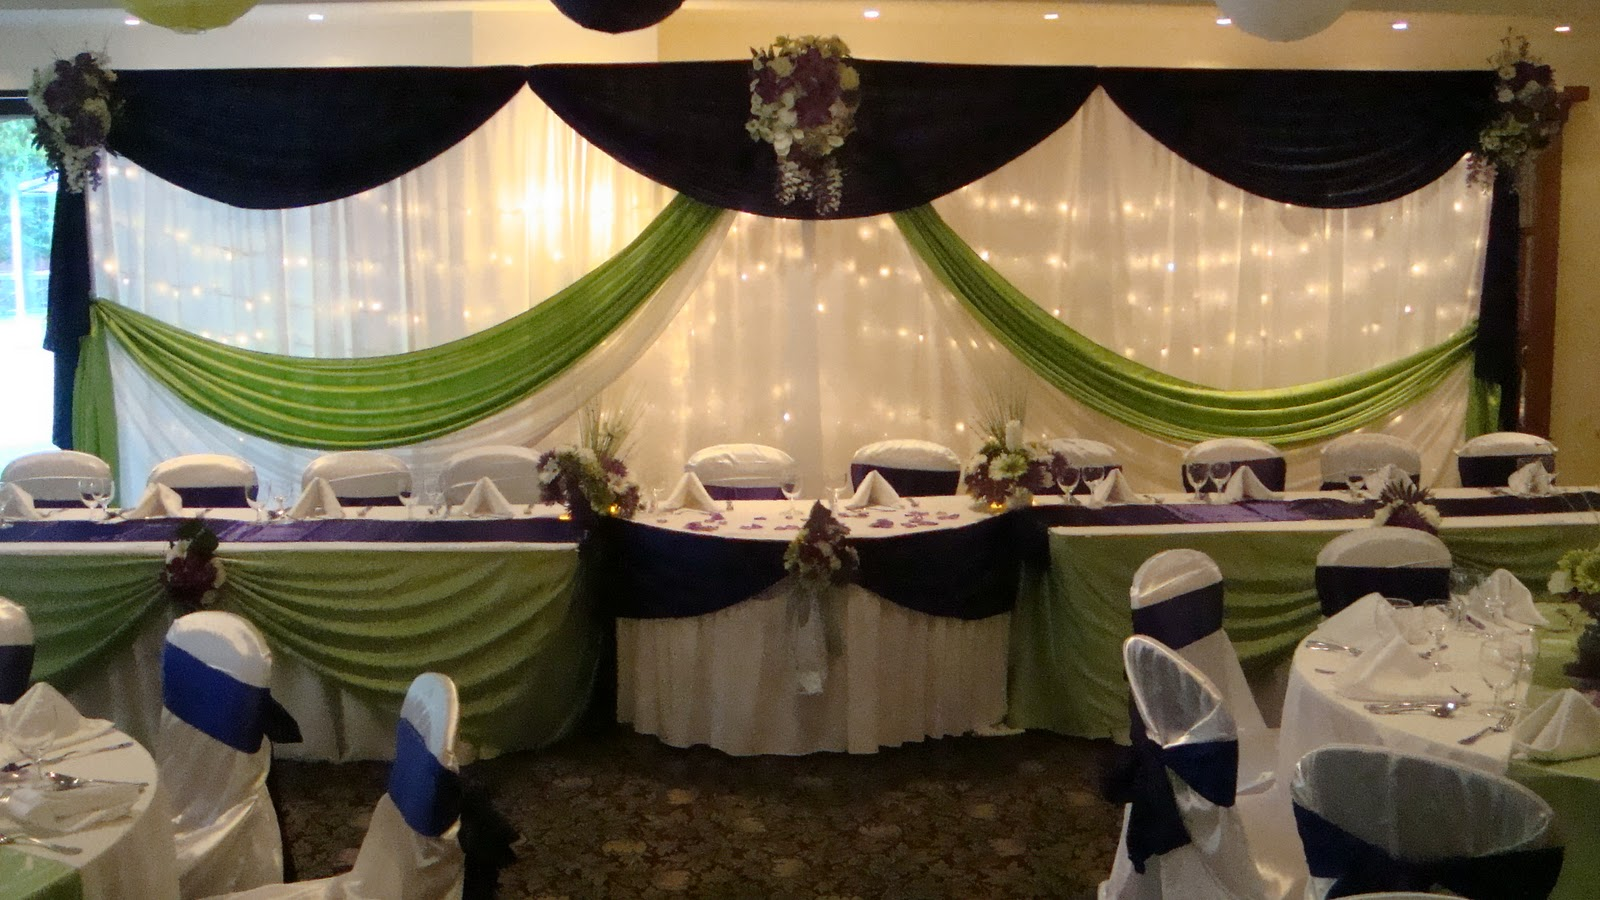 Chair Cover Rentals Victoria Bc Rp Module Wedding Decoration Reception Decor